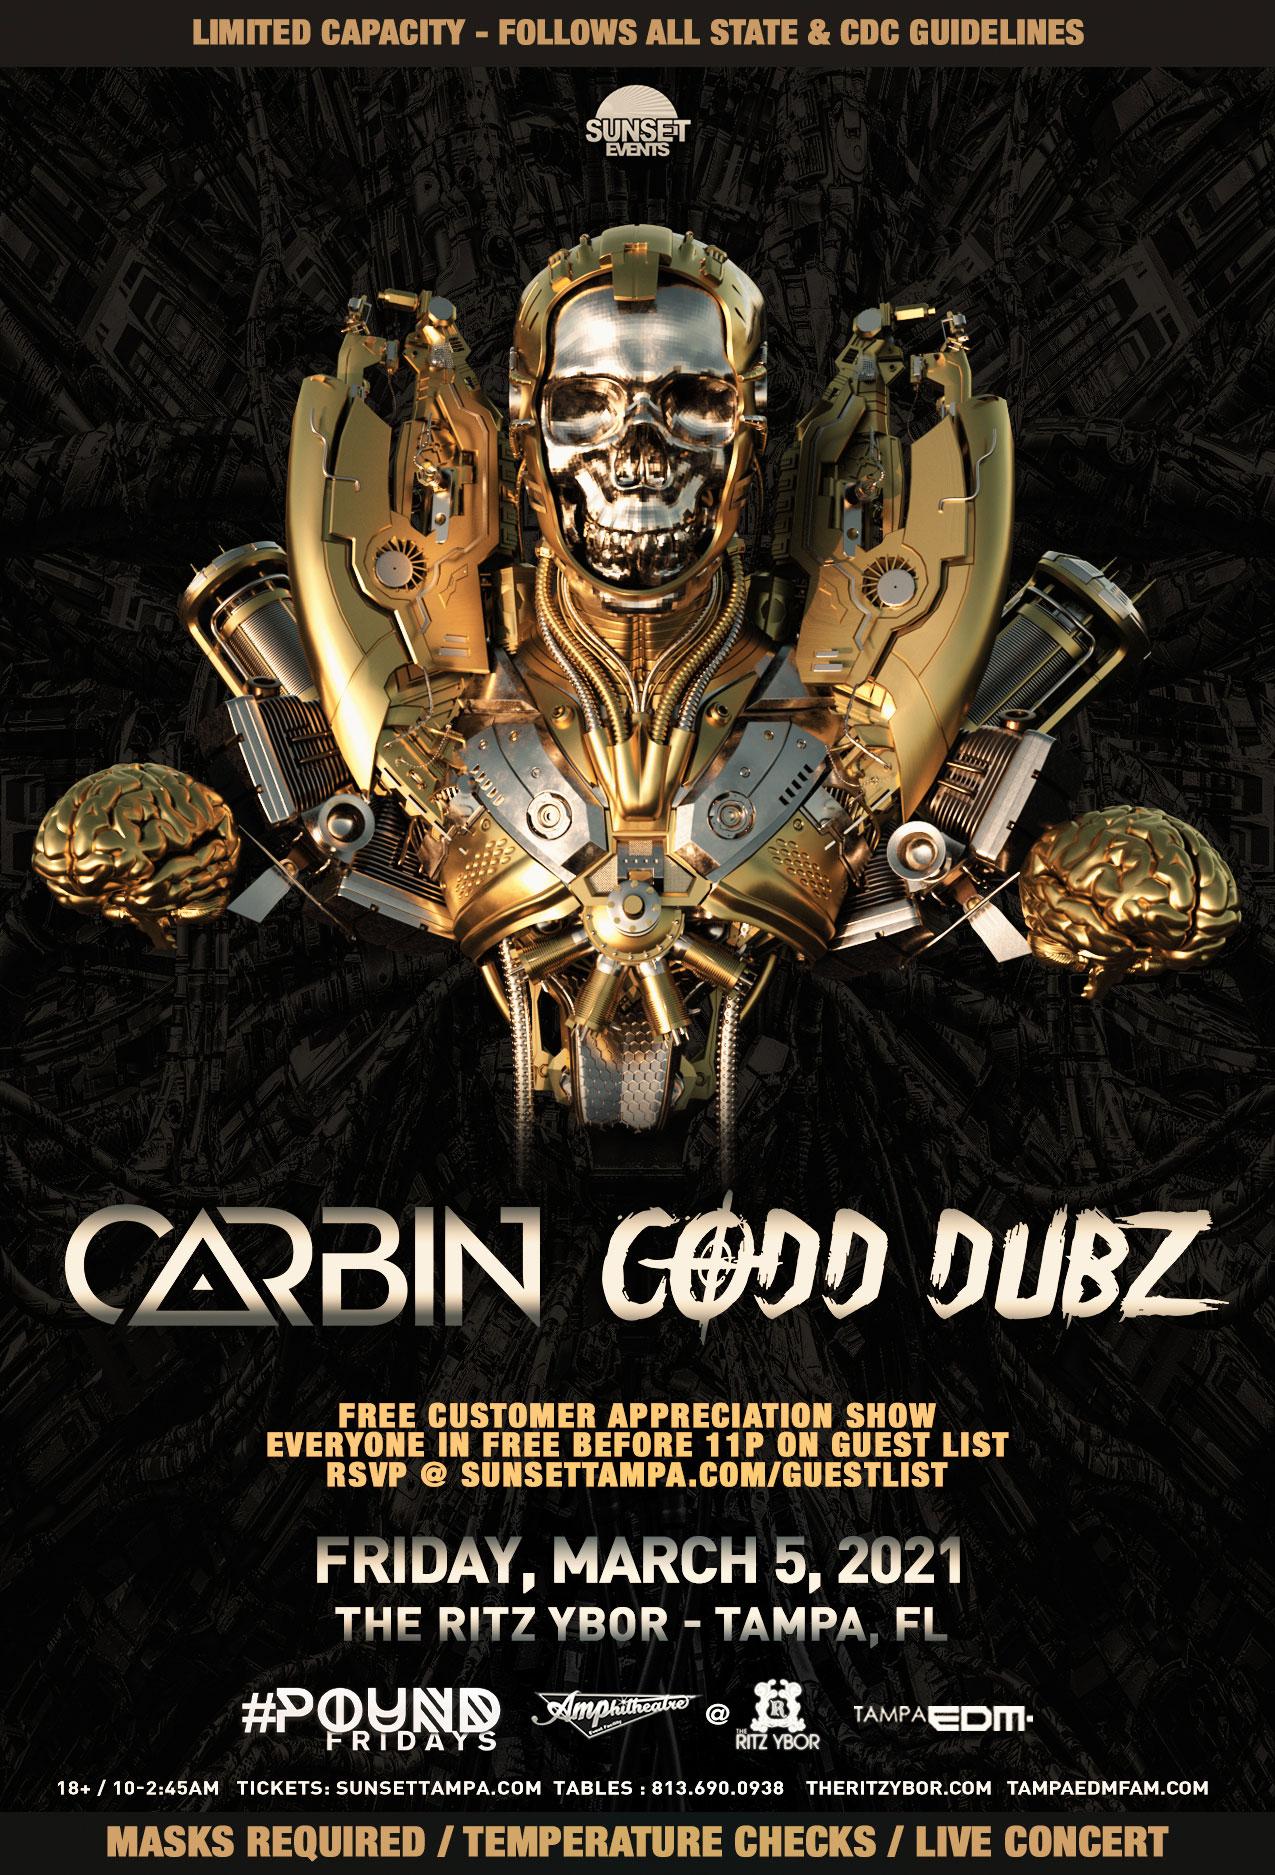 Carbin & Codd Dubz for #POUND Fridays at The RITZ Ybor – 3/5/2021